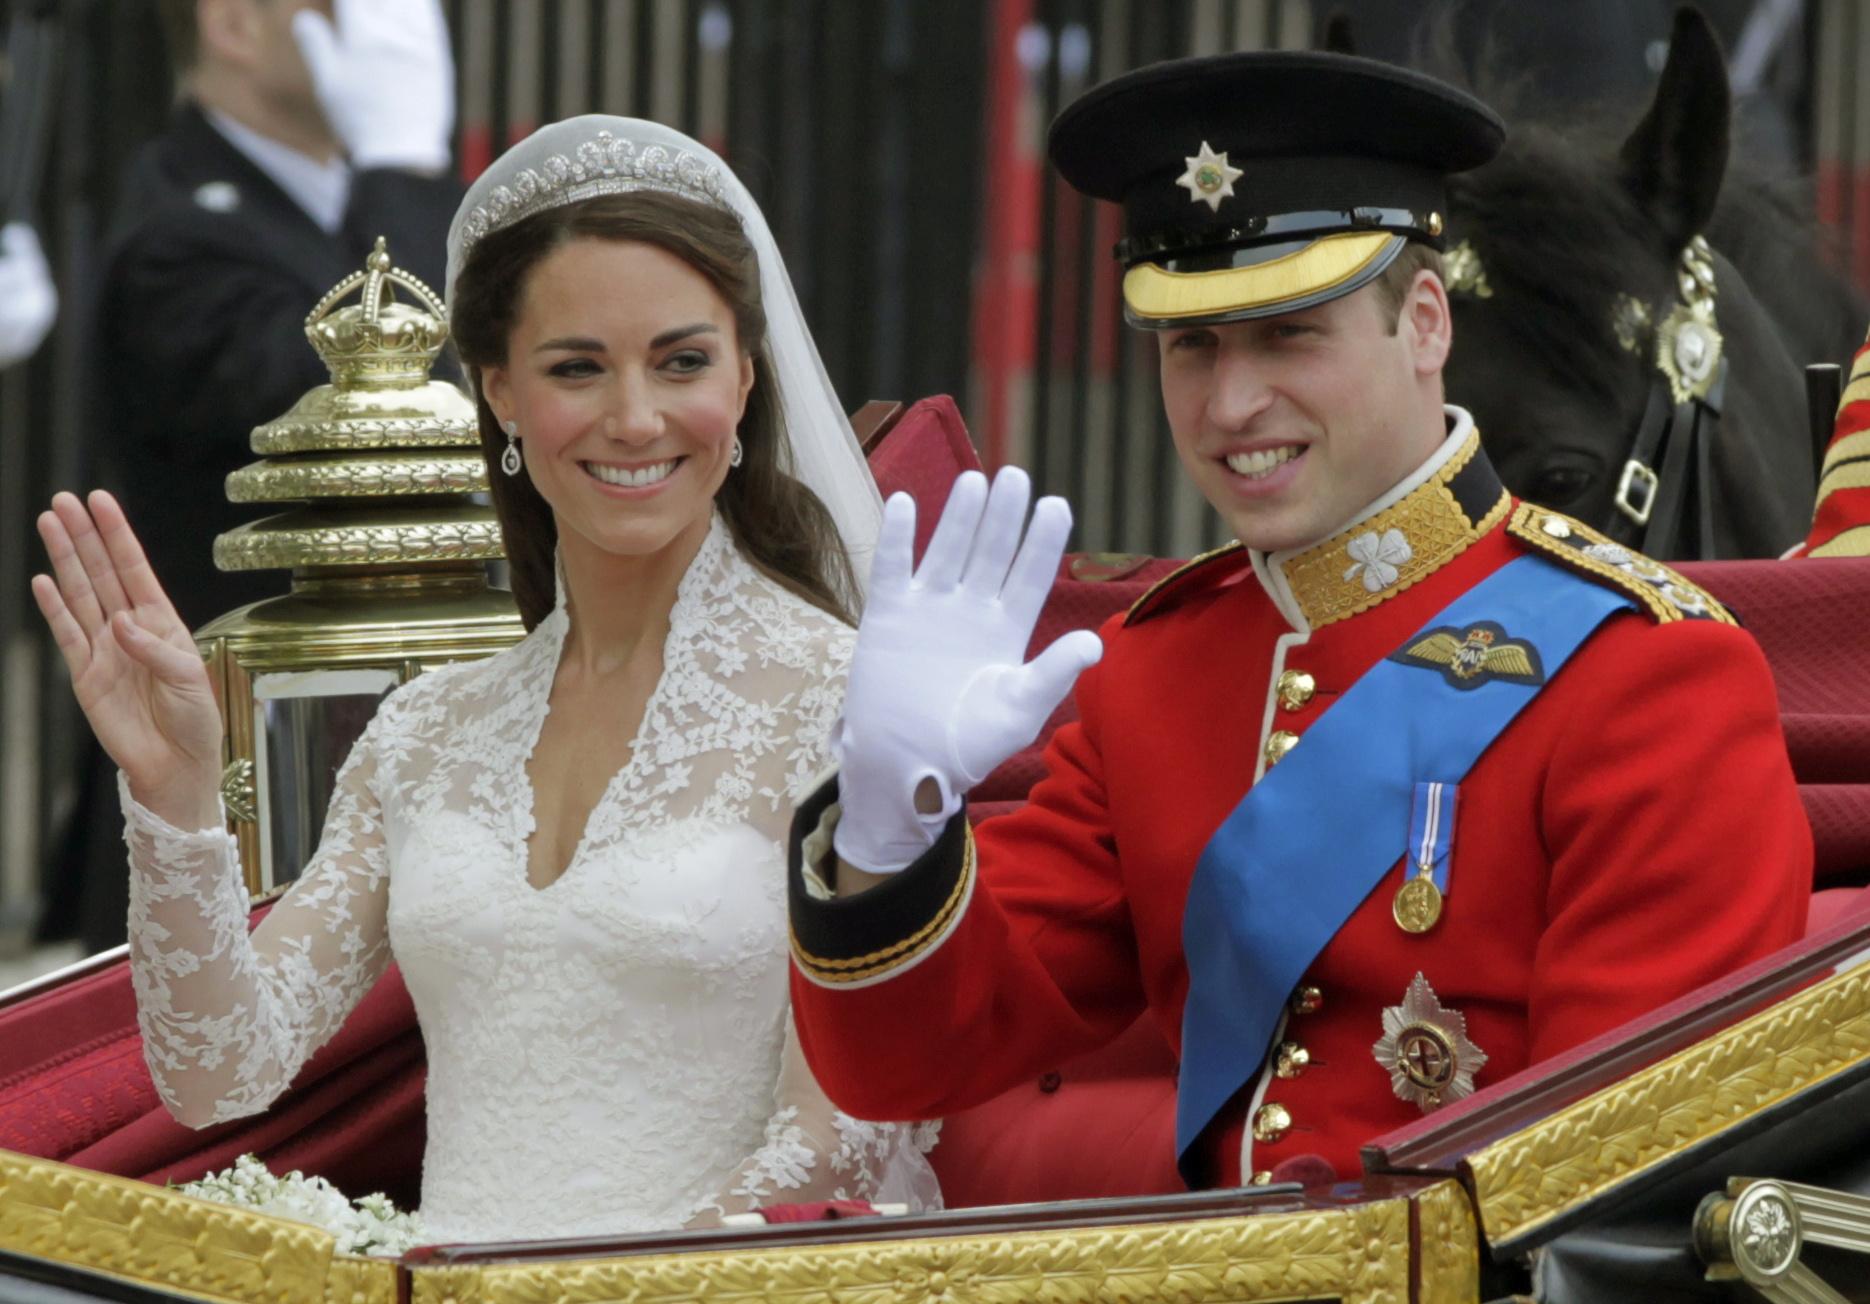 Prince William, Kate Middleton's Royal Wedding Anniversary